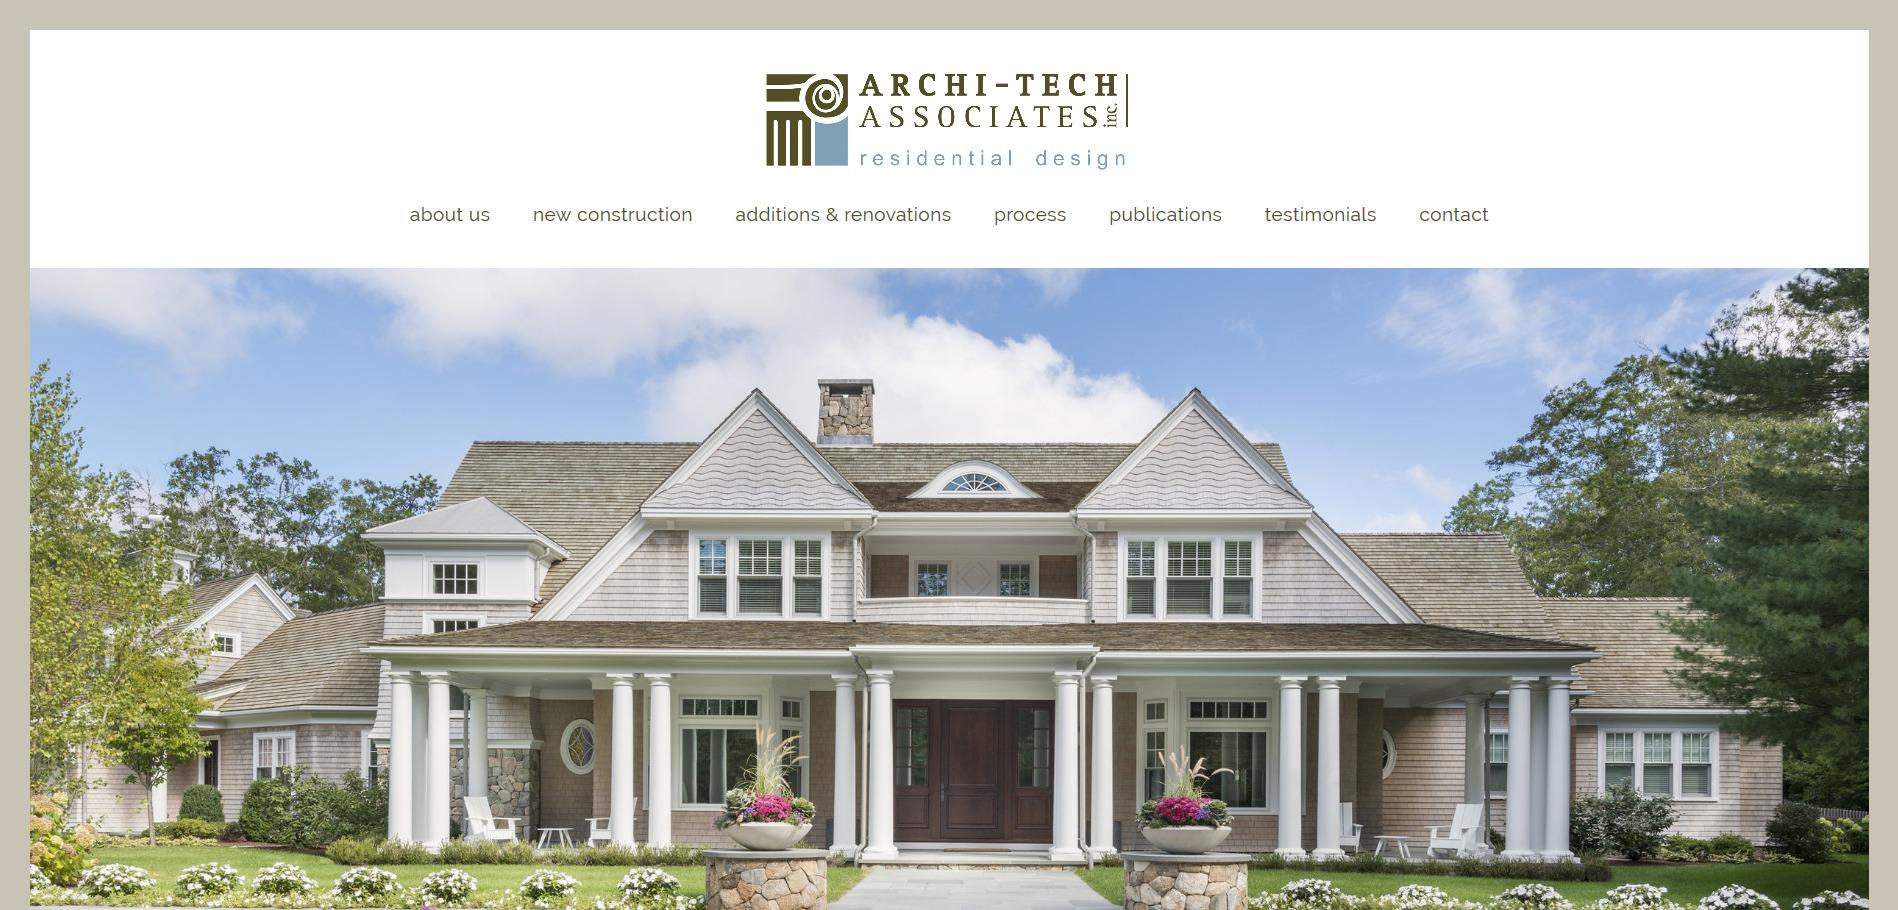 Archi-Tech Associates